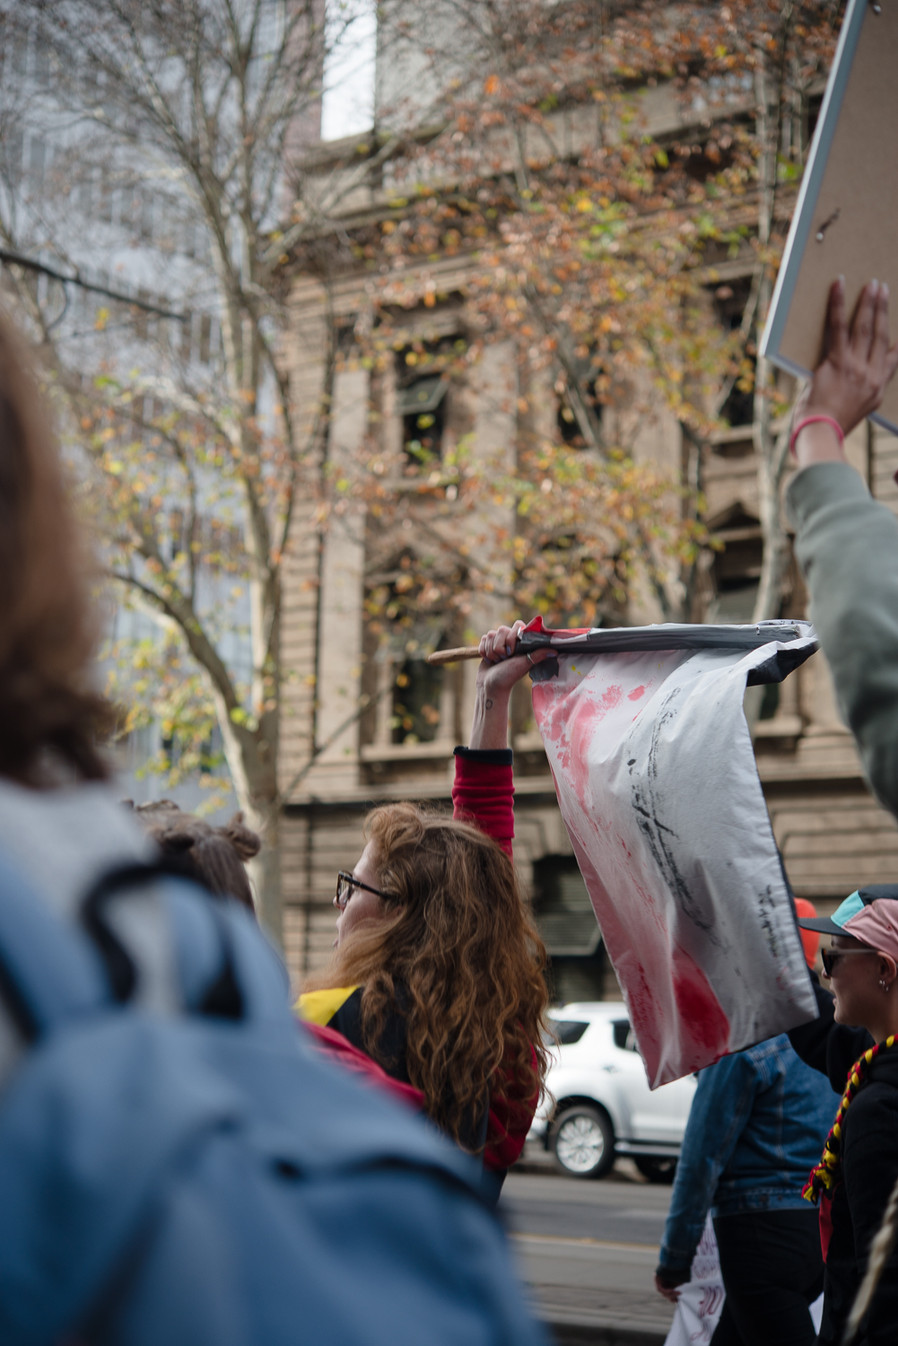 protest_incolour_screen-3.jpg